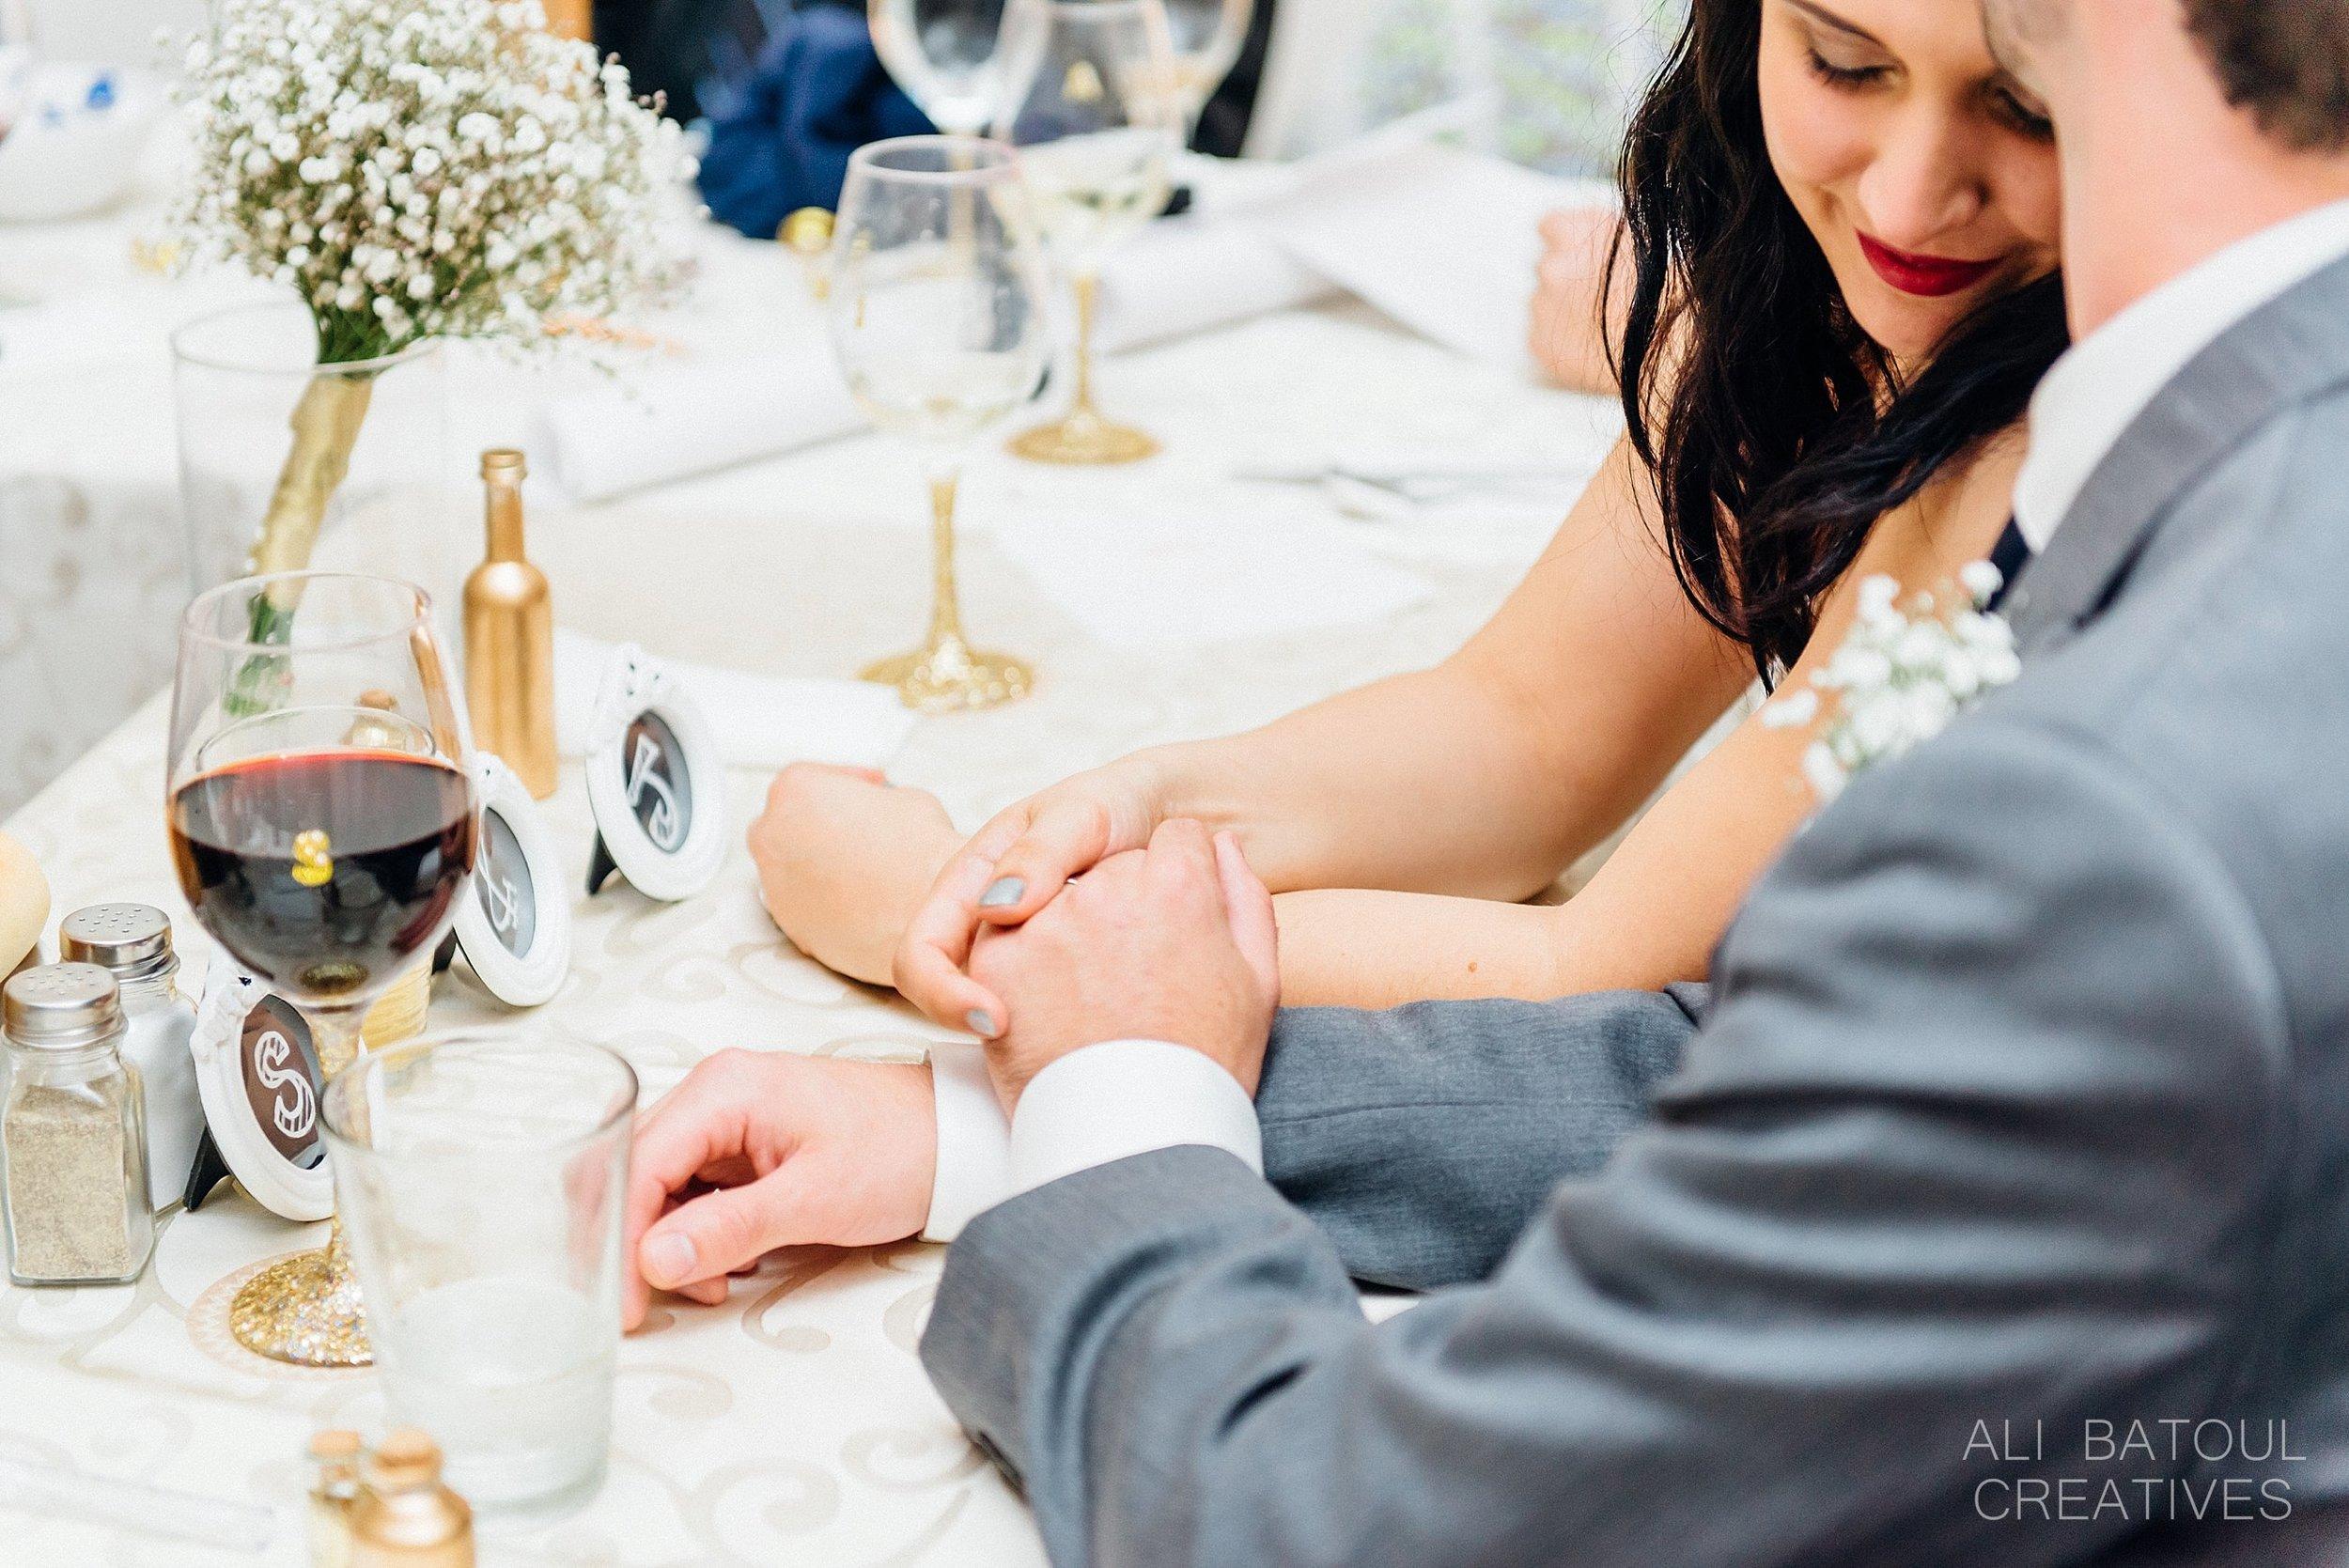 Jocelyn + Steve At The Schoolhouse Wedding - Ali and Batoul Fine Art Wedding Photography_0098.jpg